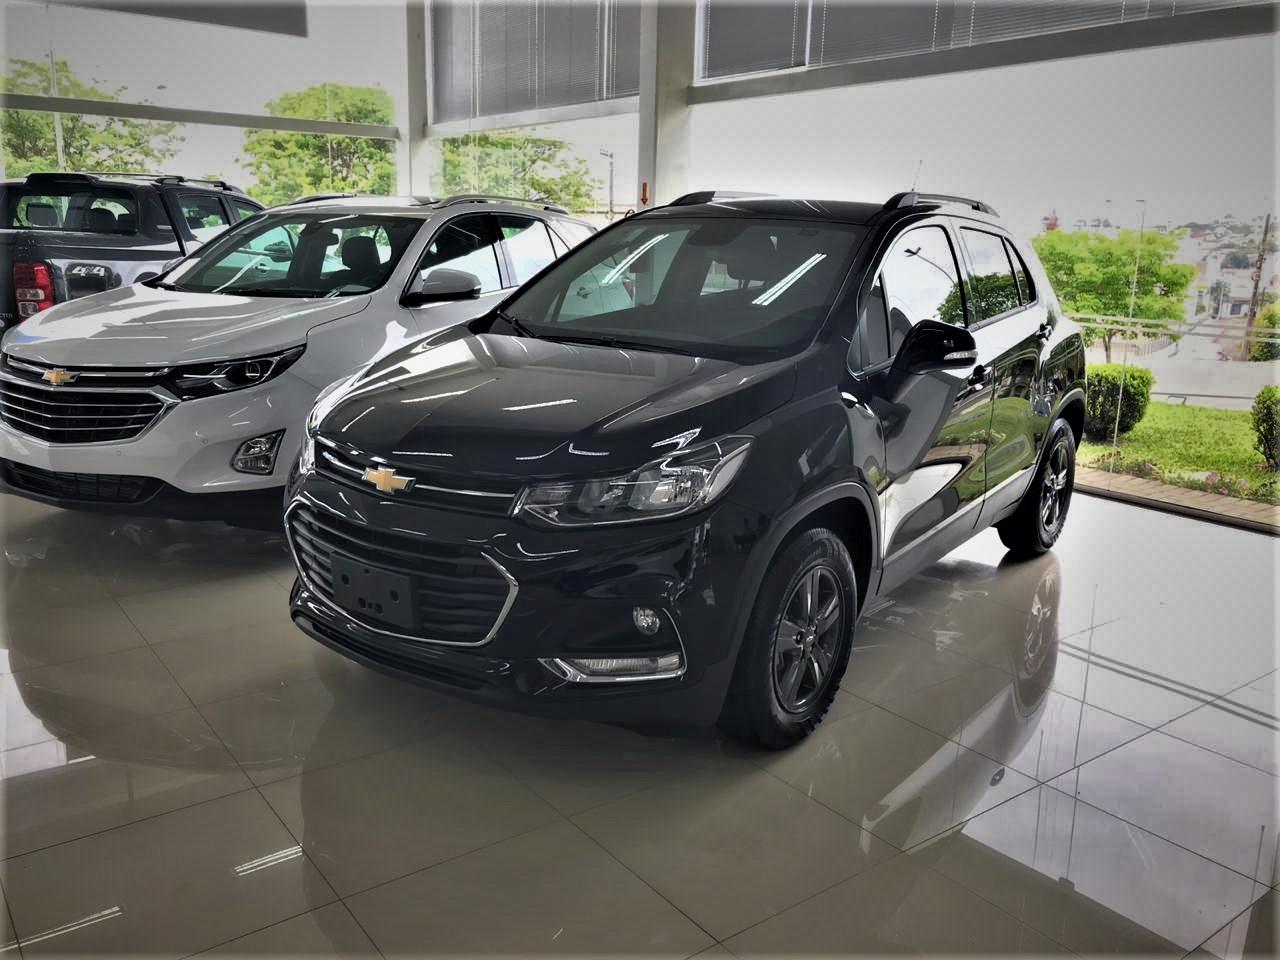 Chevrolet I/CHEV TRACKER LT ZERO KM 1.4 2018